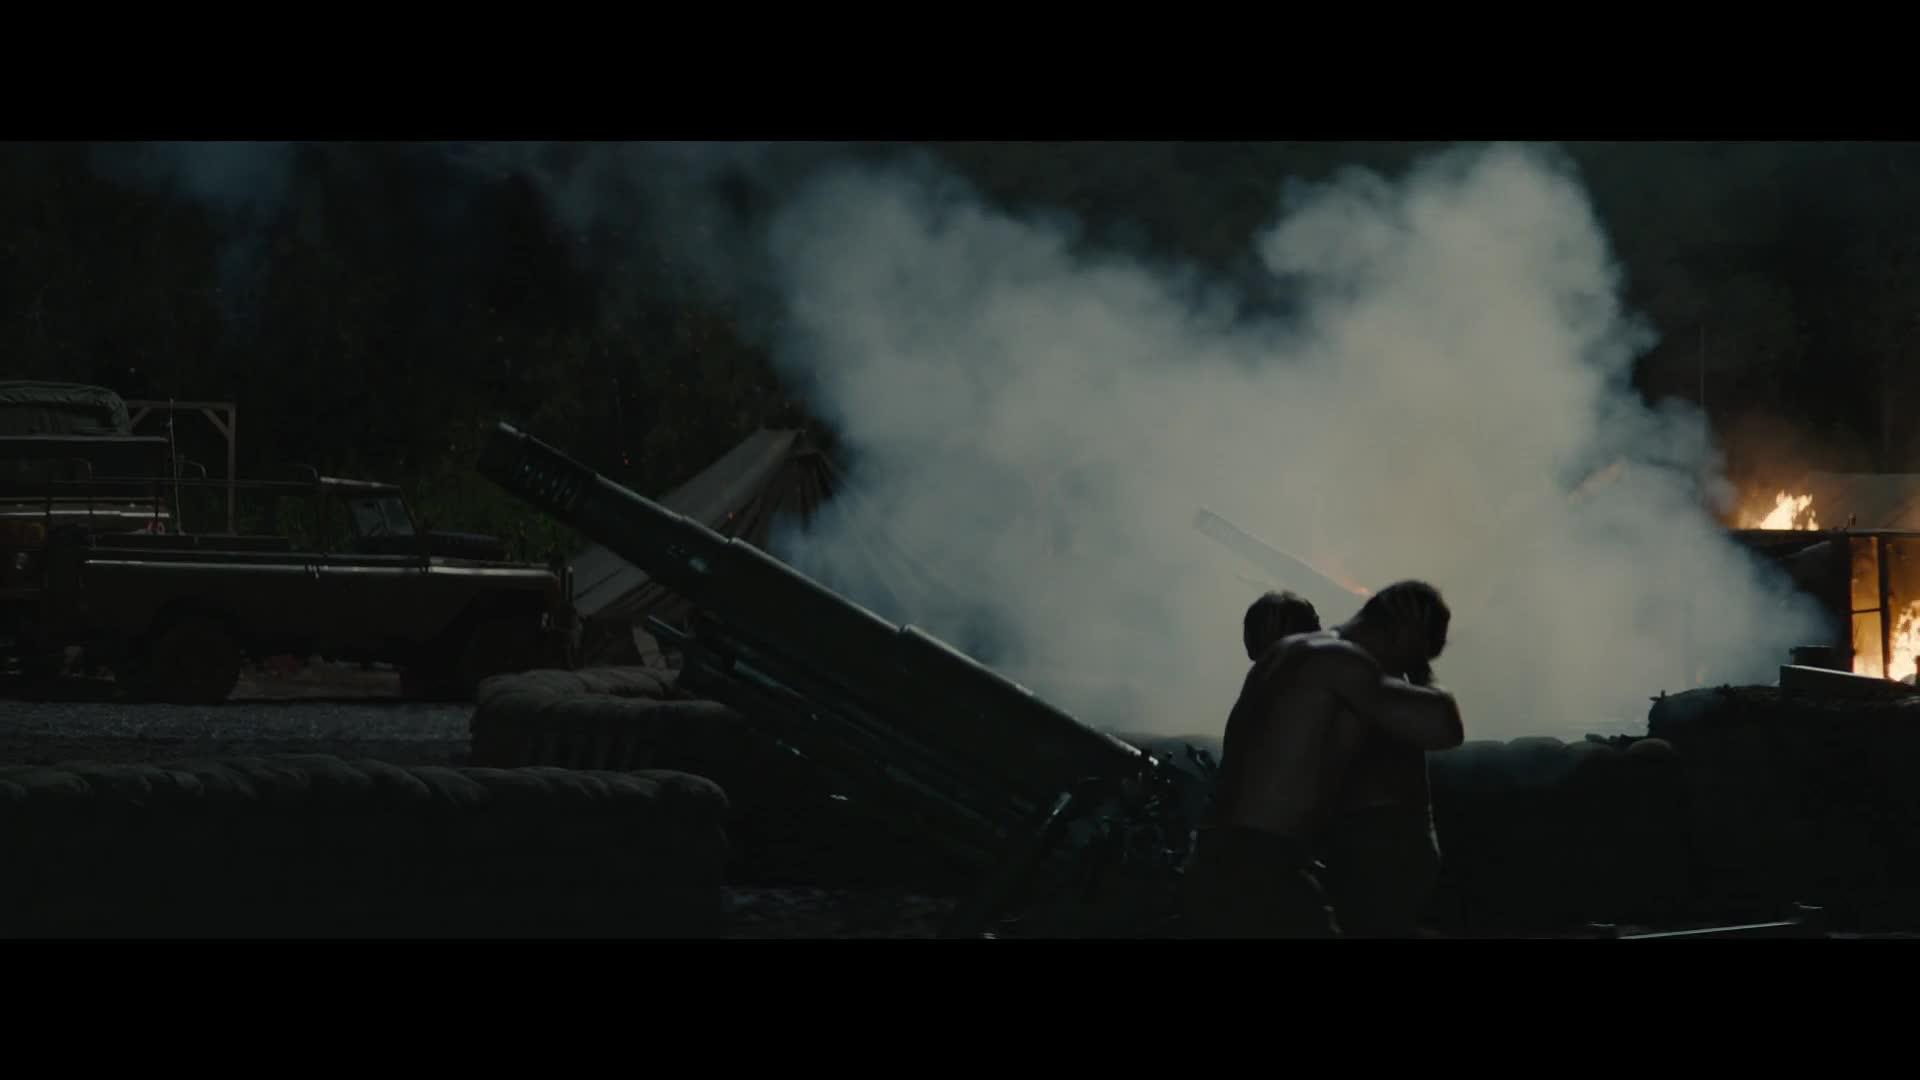 Danger Close The Battle of Long Tan เขต ปิดอันตราย การต่อสู้ของลองตัน (2019)